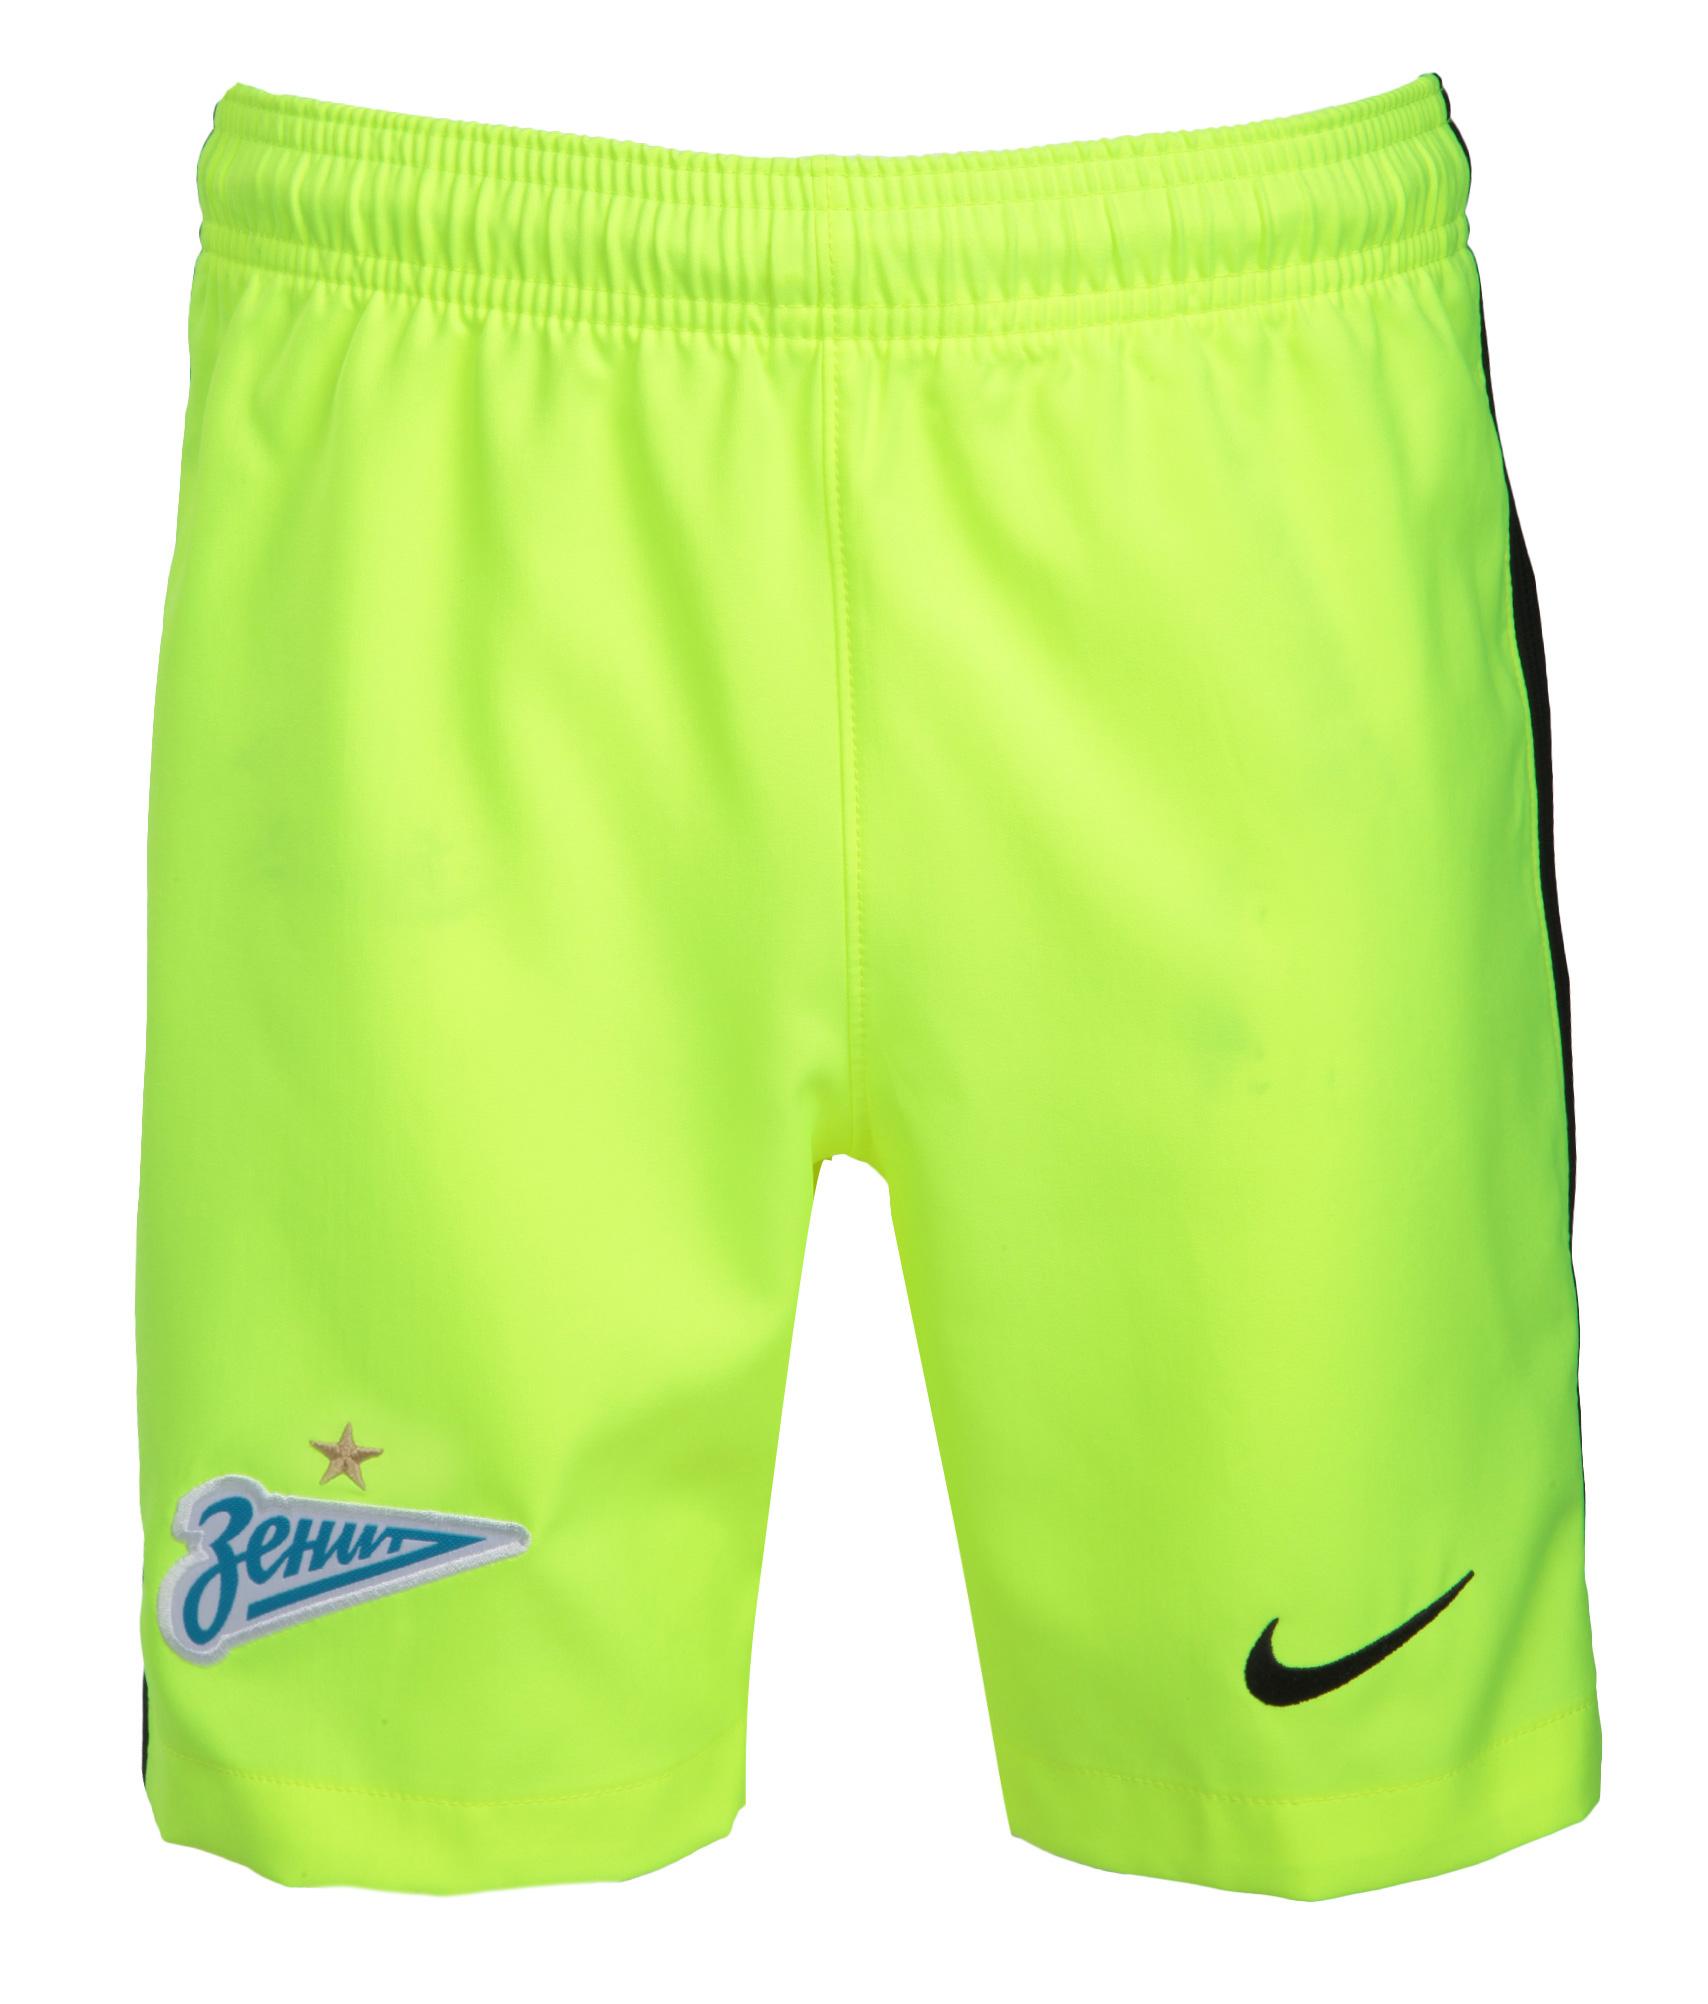 Детские вратарские шорты, Цвет-Желтый, Размер-XS детские вратарские шорты цвет зеленый размер xs